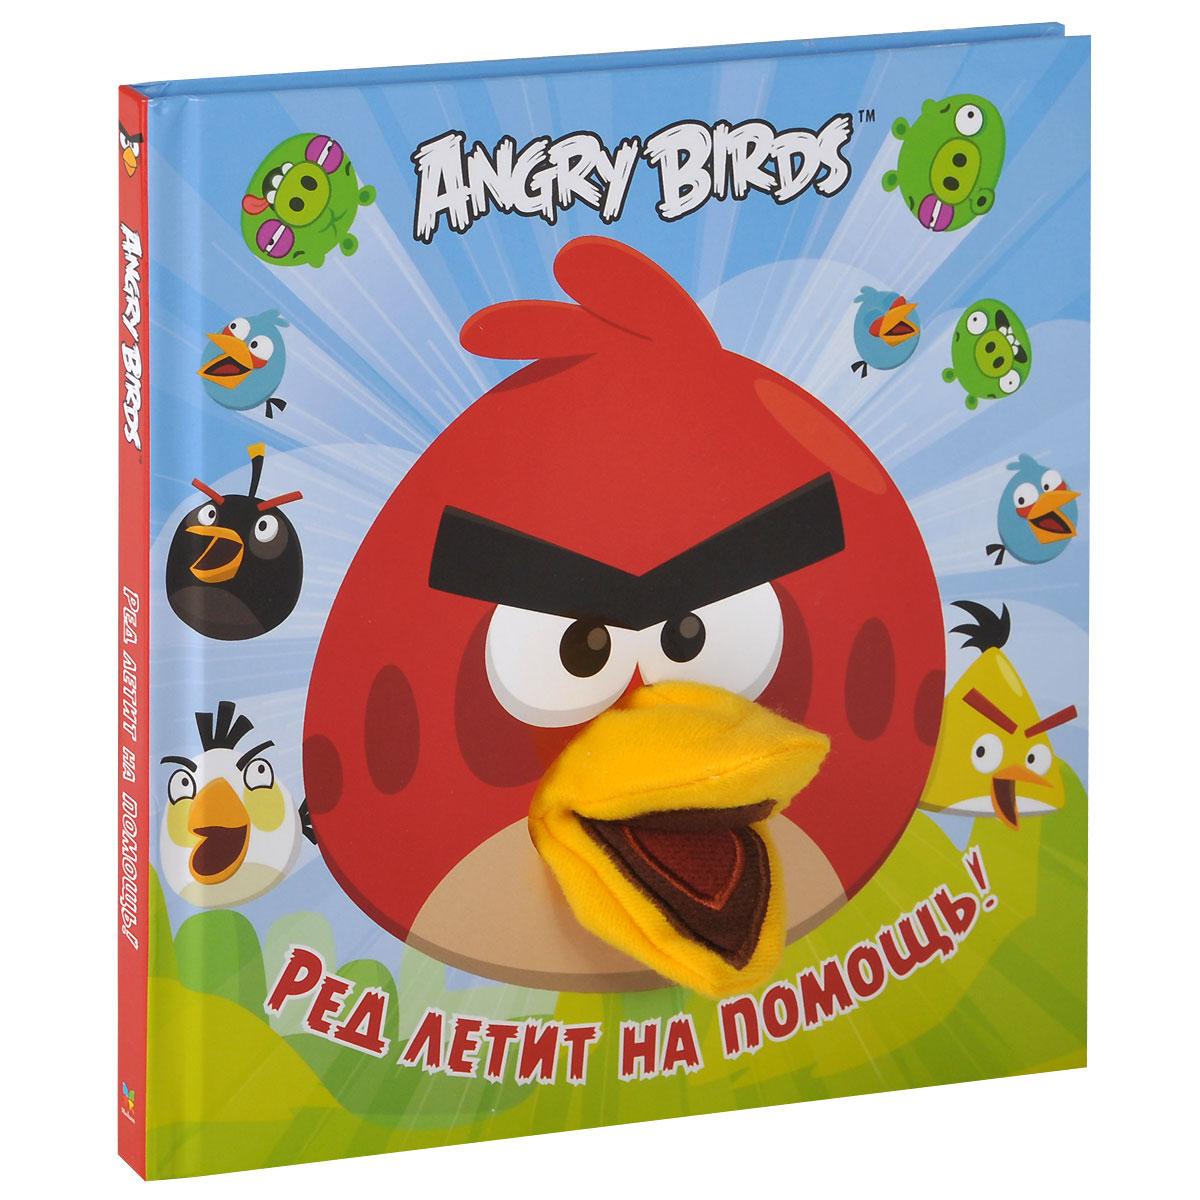 Angry Birds. Ред летит на помощь! Книжка-игрушка